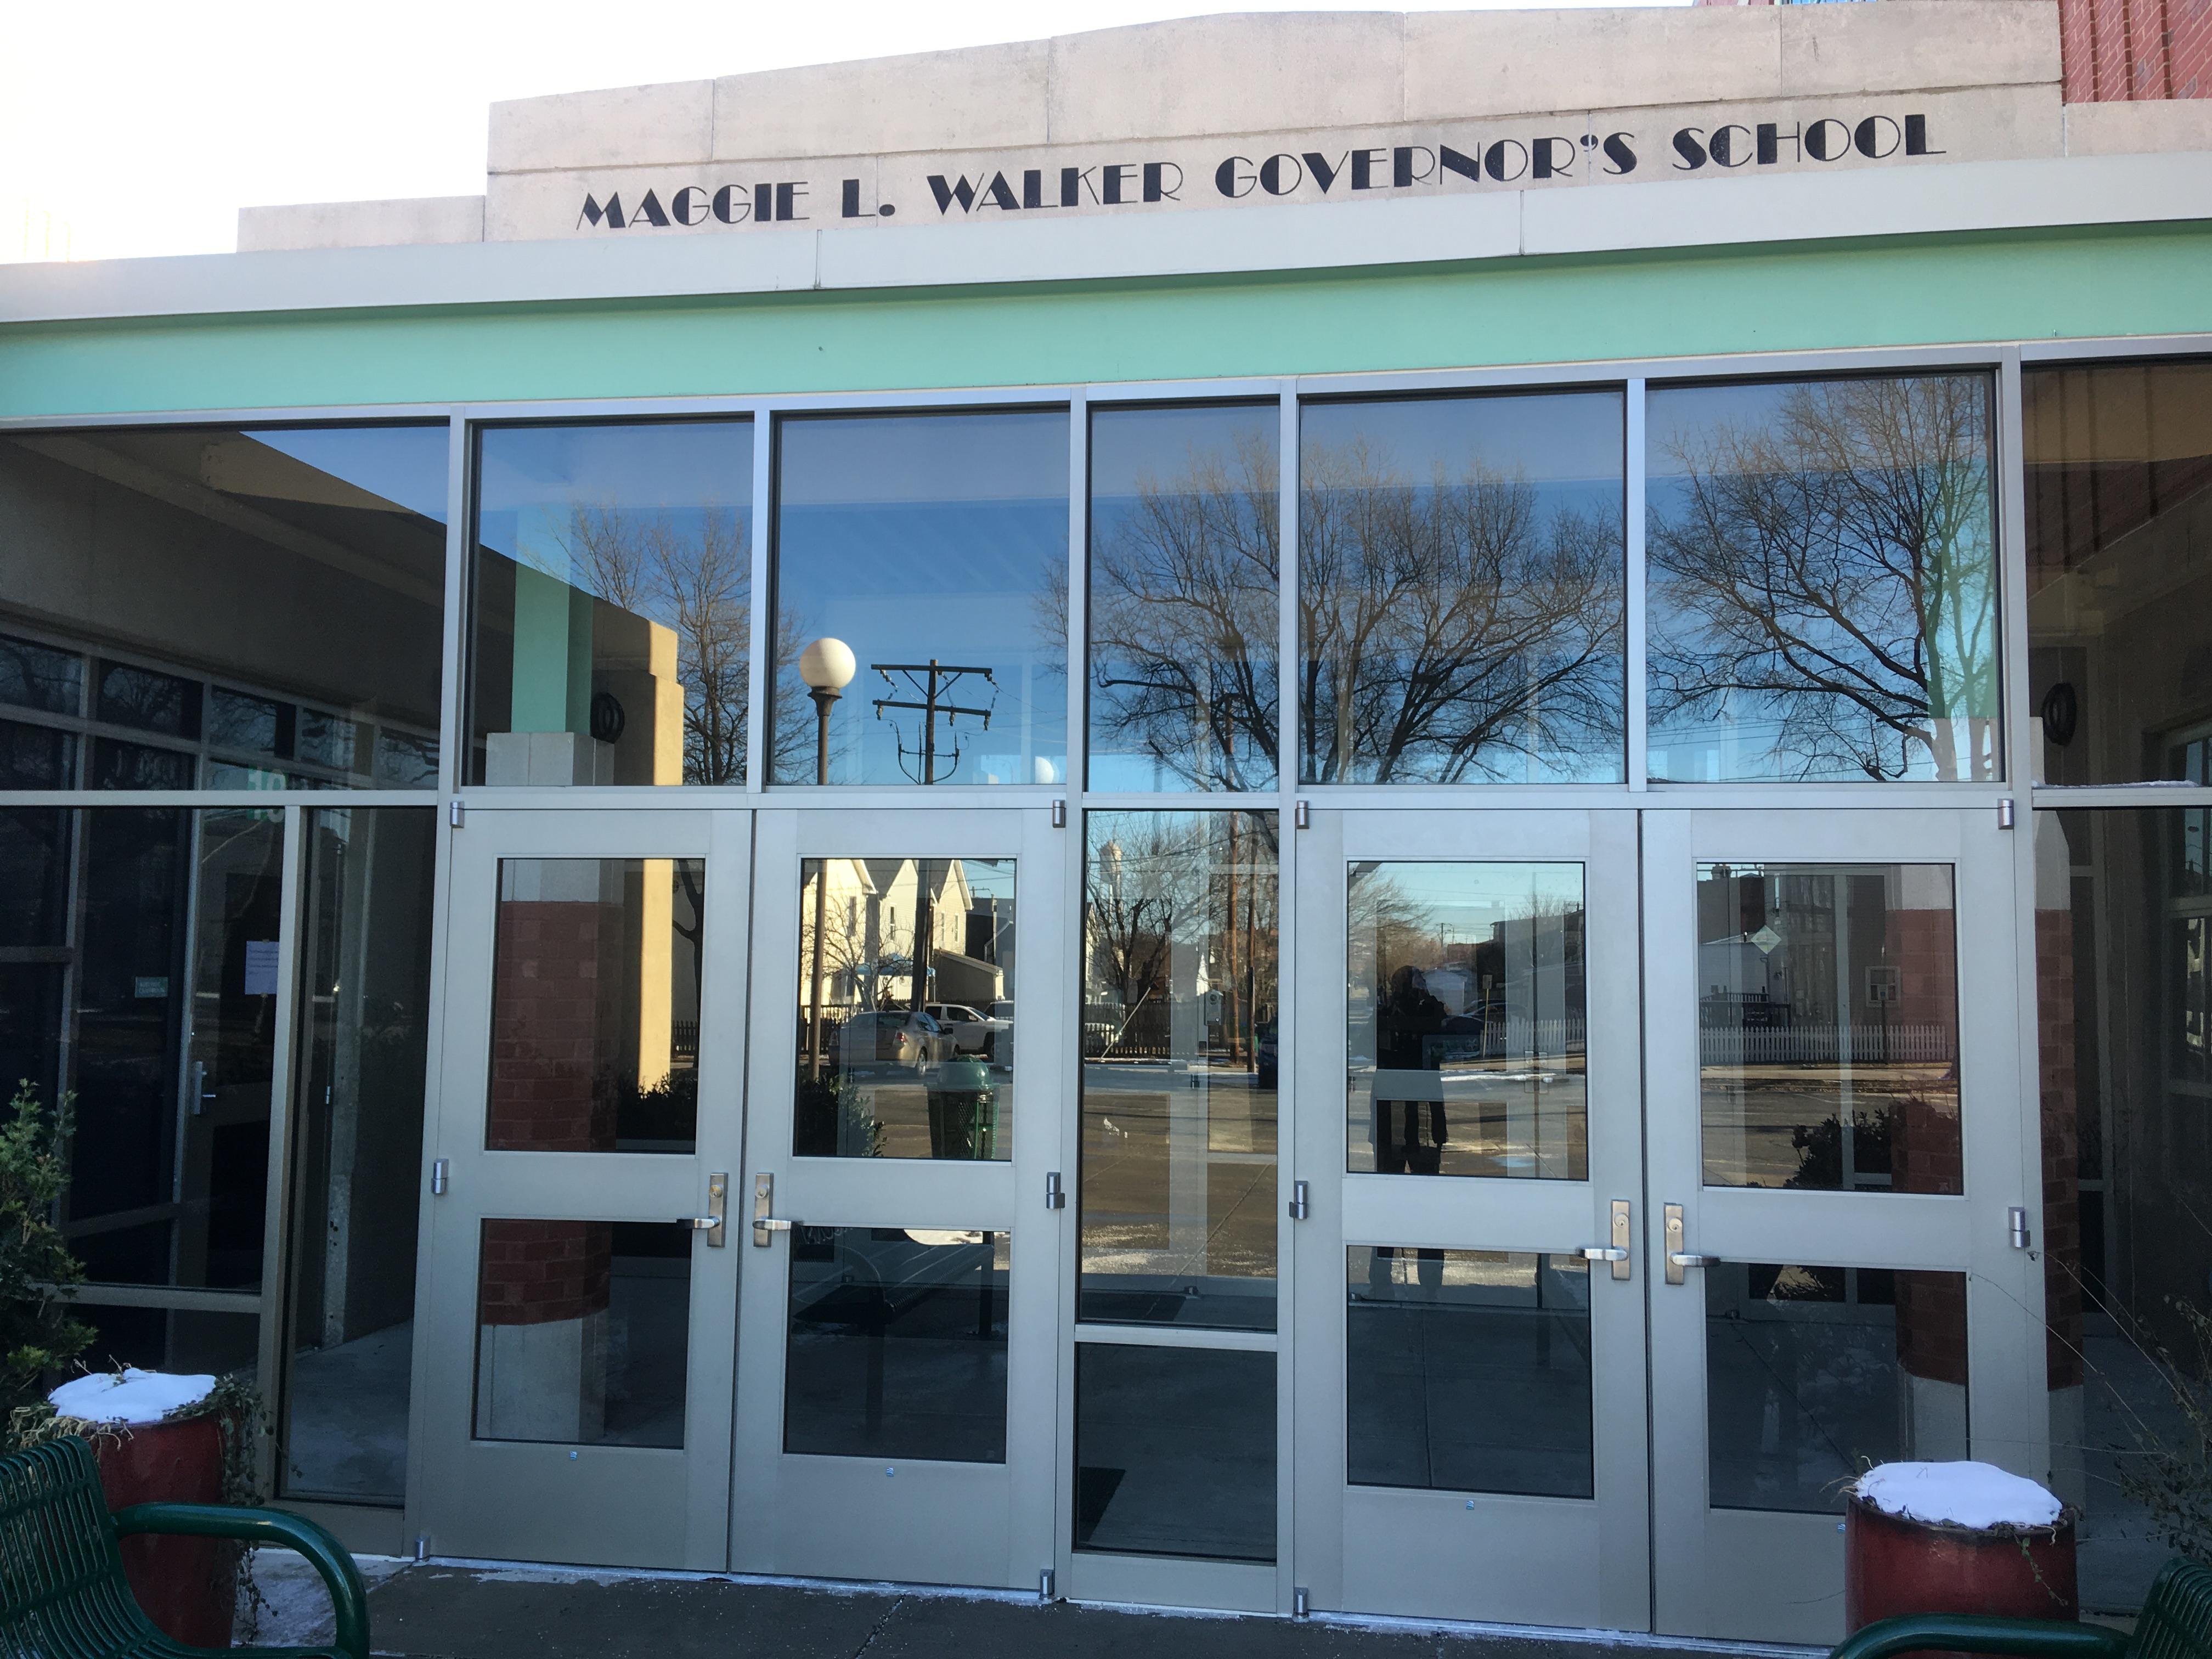 Vestibule exterior 2018 b & MLWGS Regional School Board Meeting and FY19 Budget Work Session ...